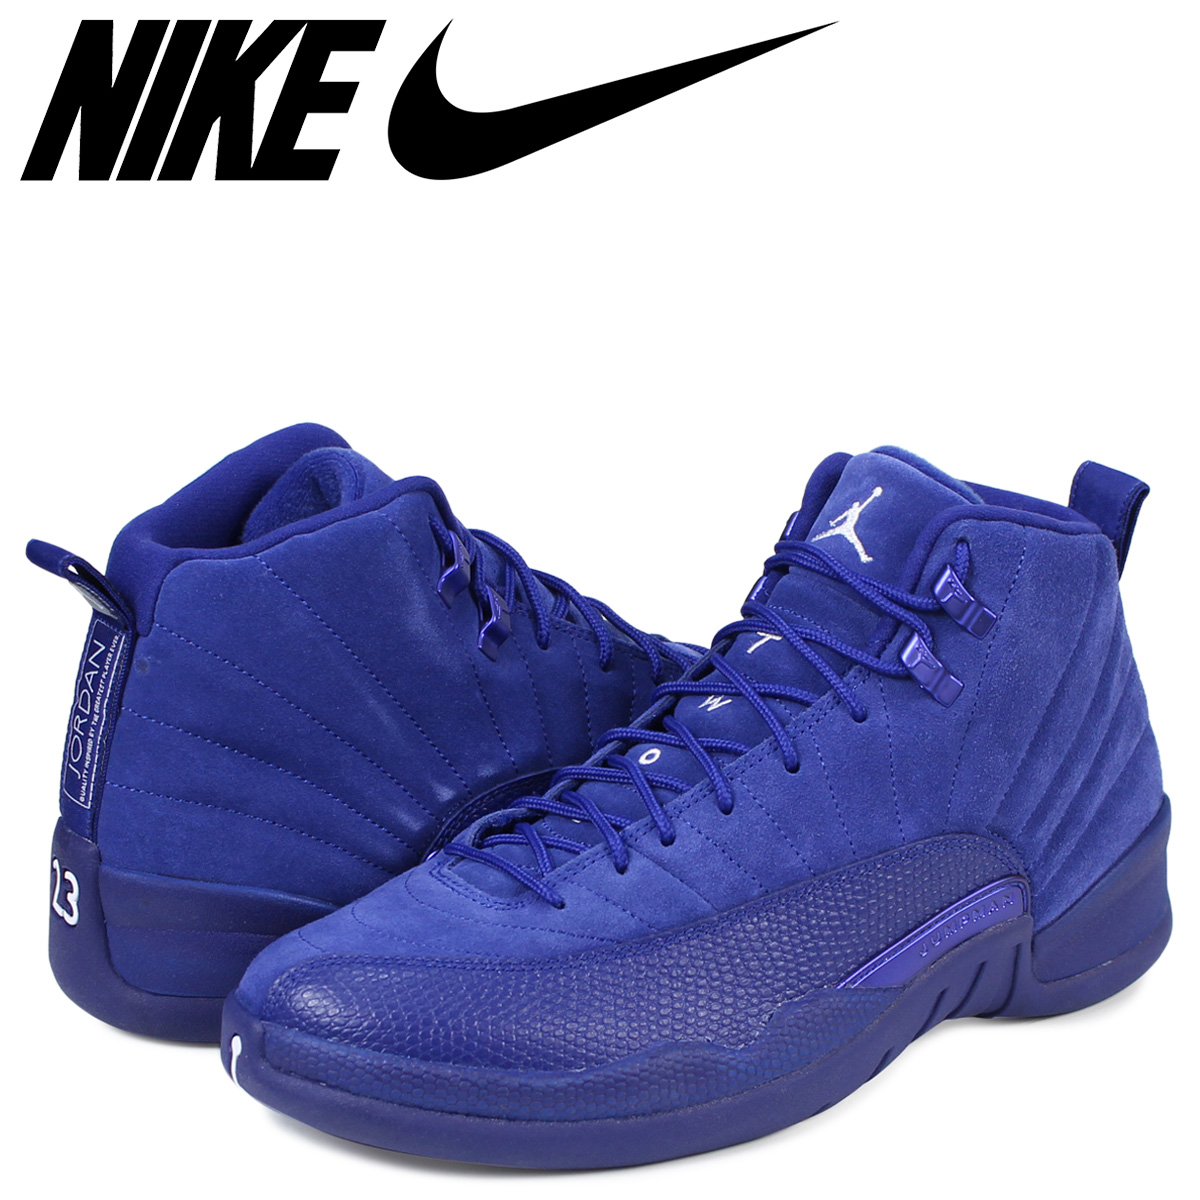 fc5ecf505a764 ... france nike air jordan 12 retro nike air jordan 12 nostalgic sneakers 130690  400 mens shoes